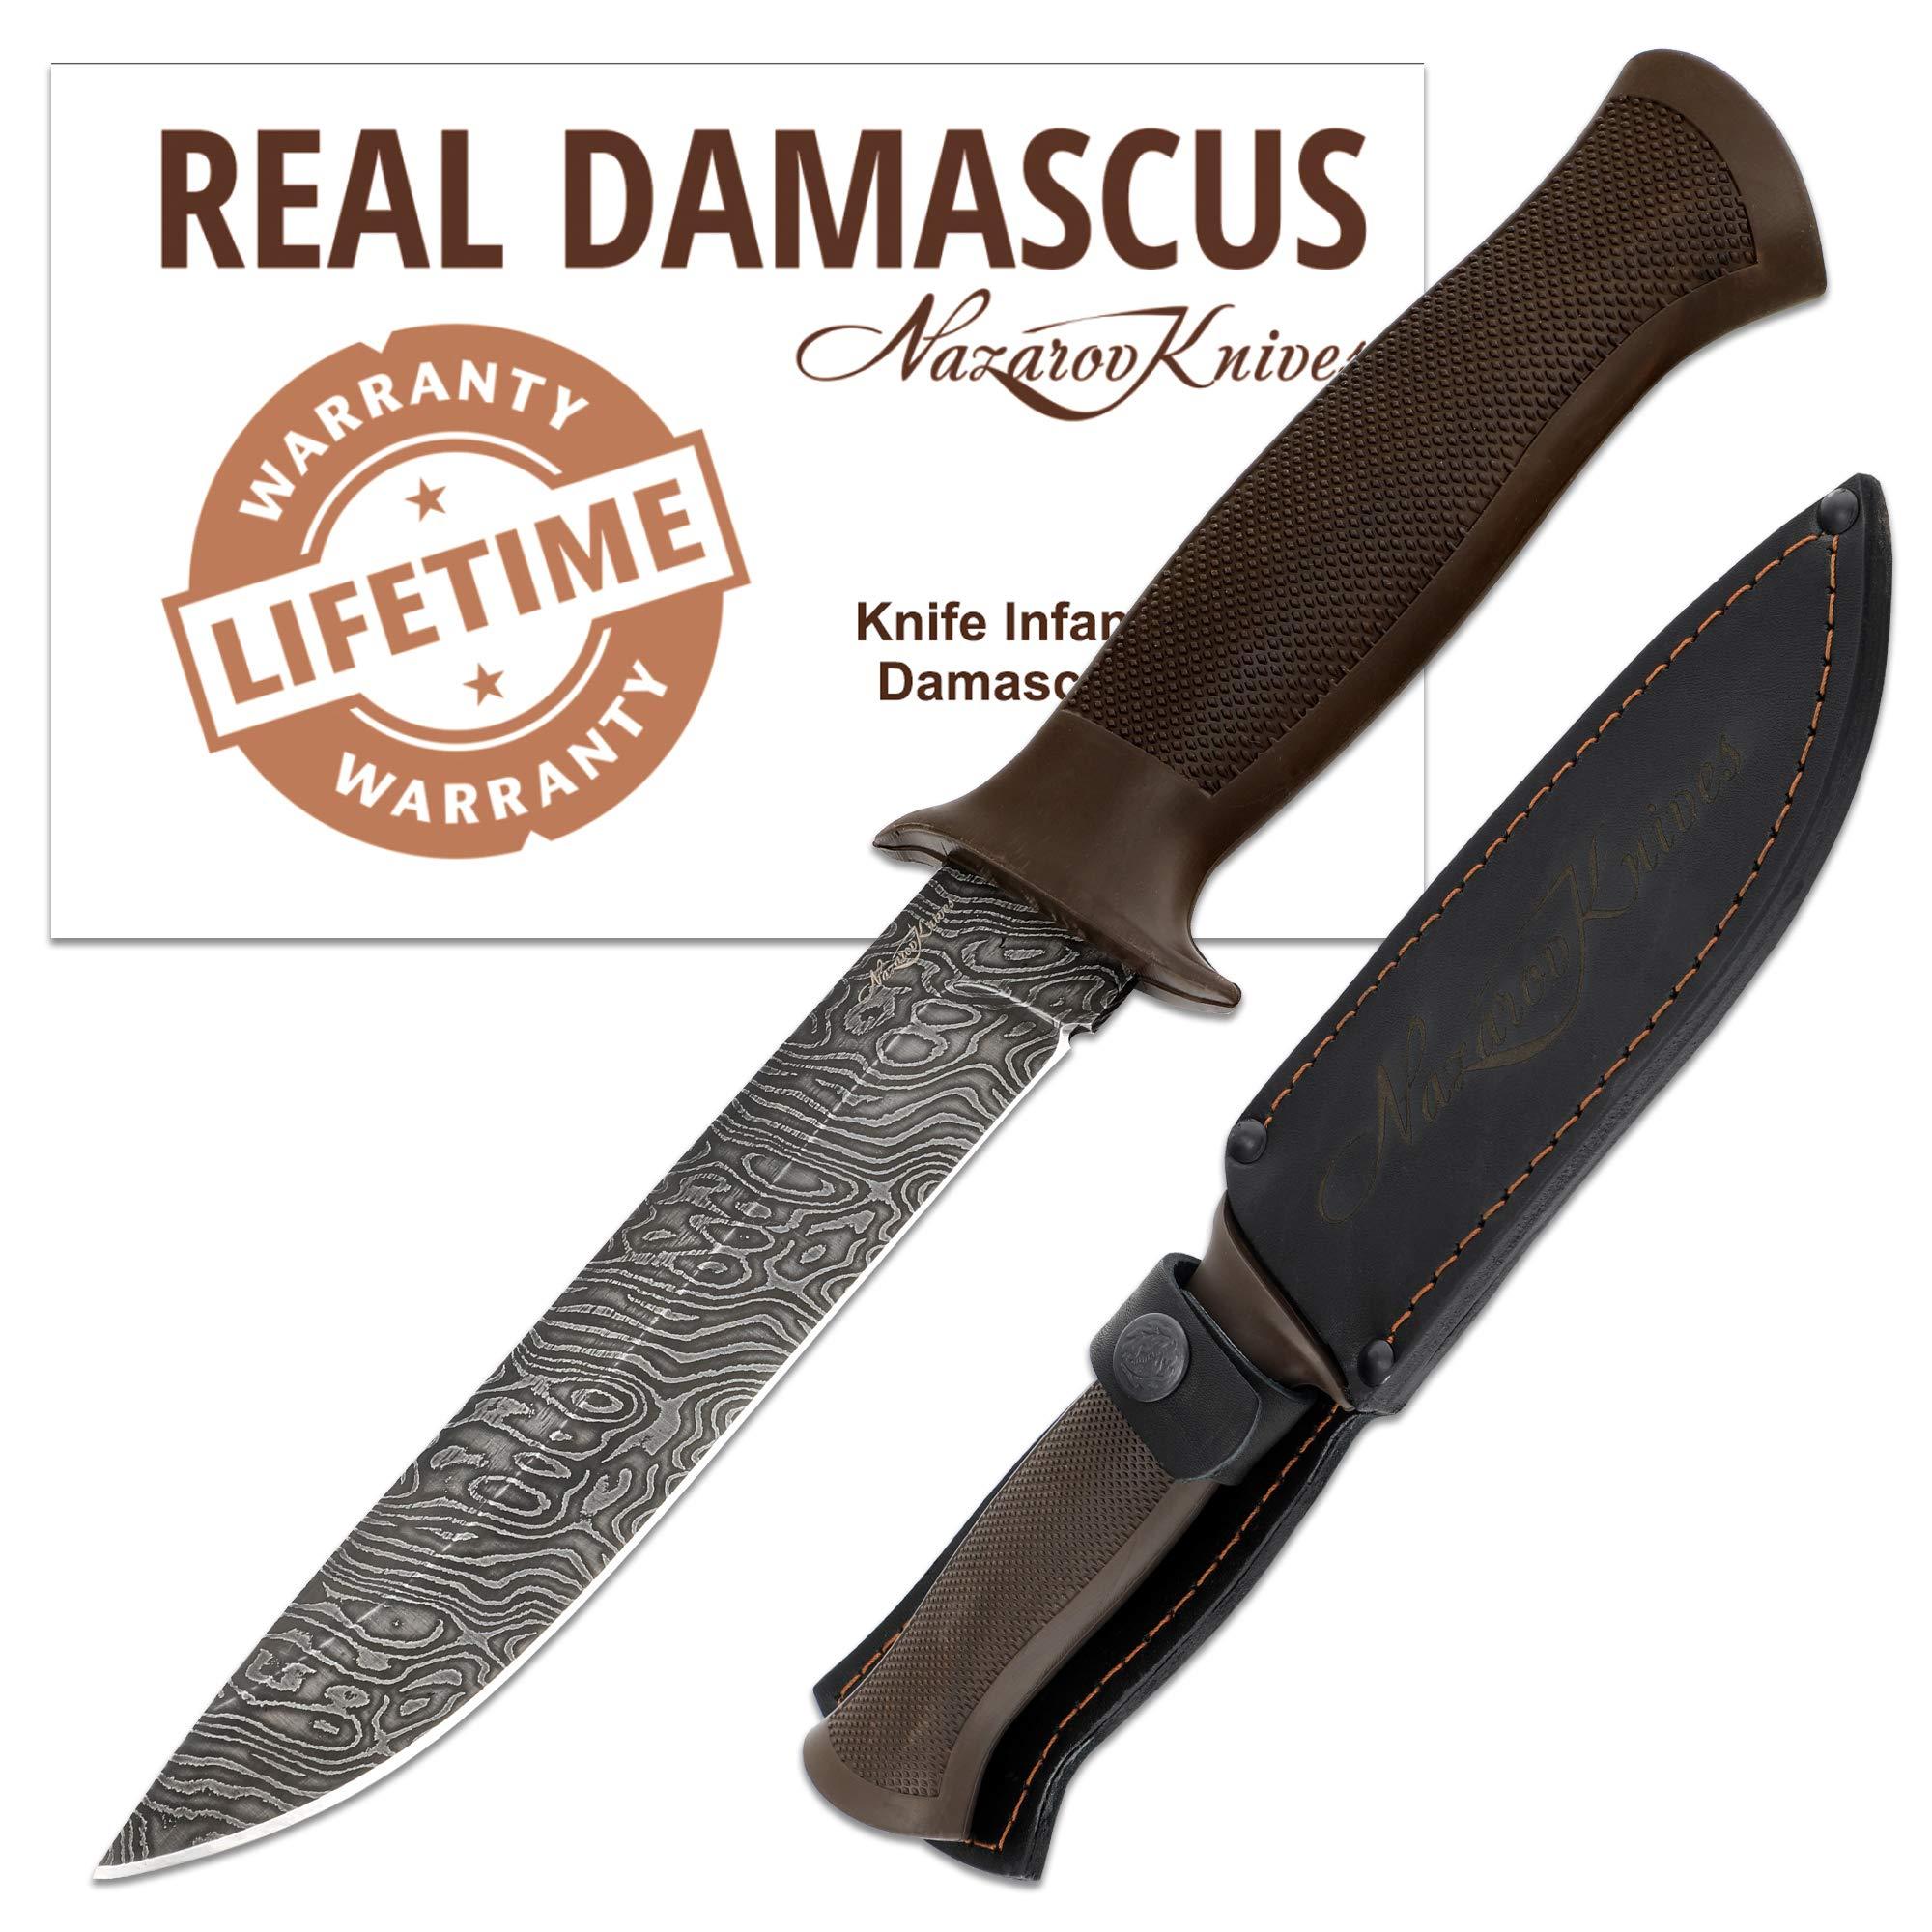 Hunting Knife - Damascus Knife - Secure Grip Rubber Handle - INFANTRYMAN Standard Edition - Leather Sheath